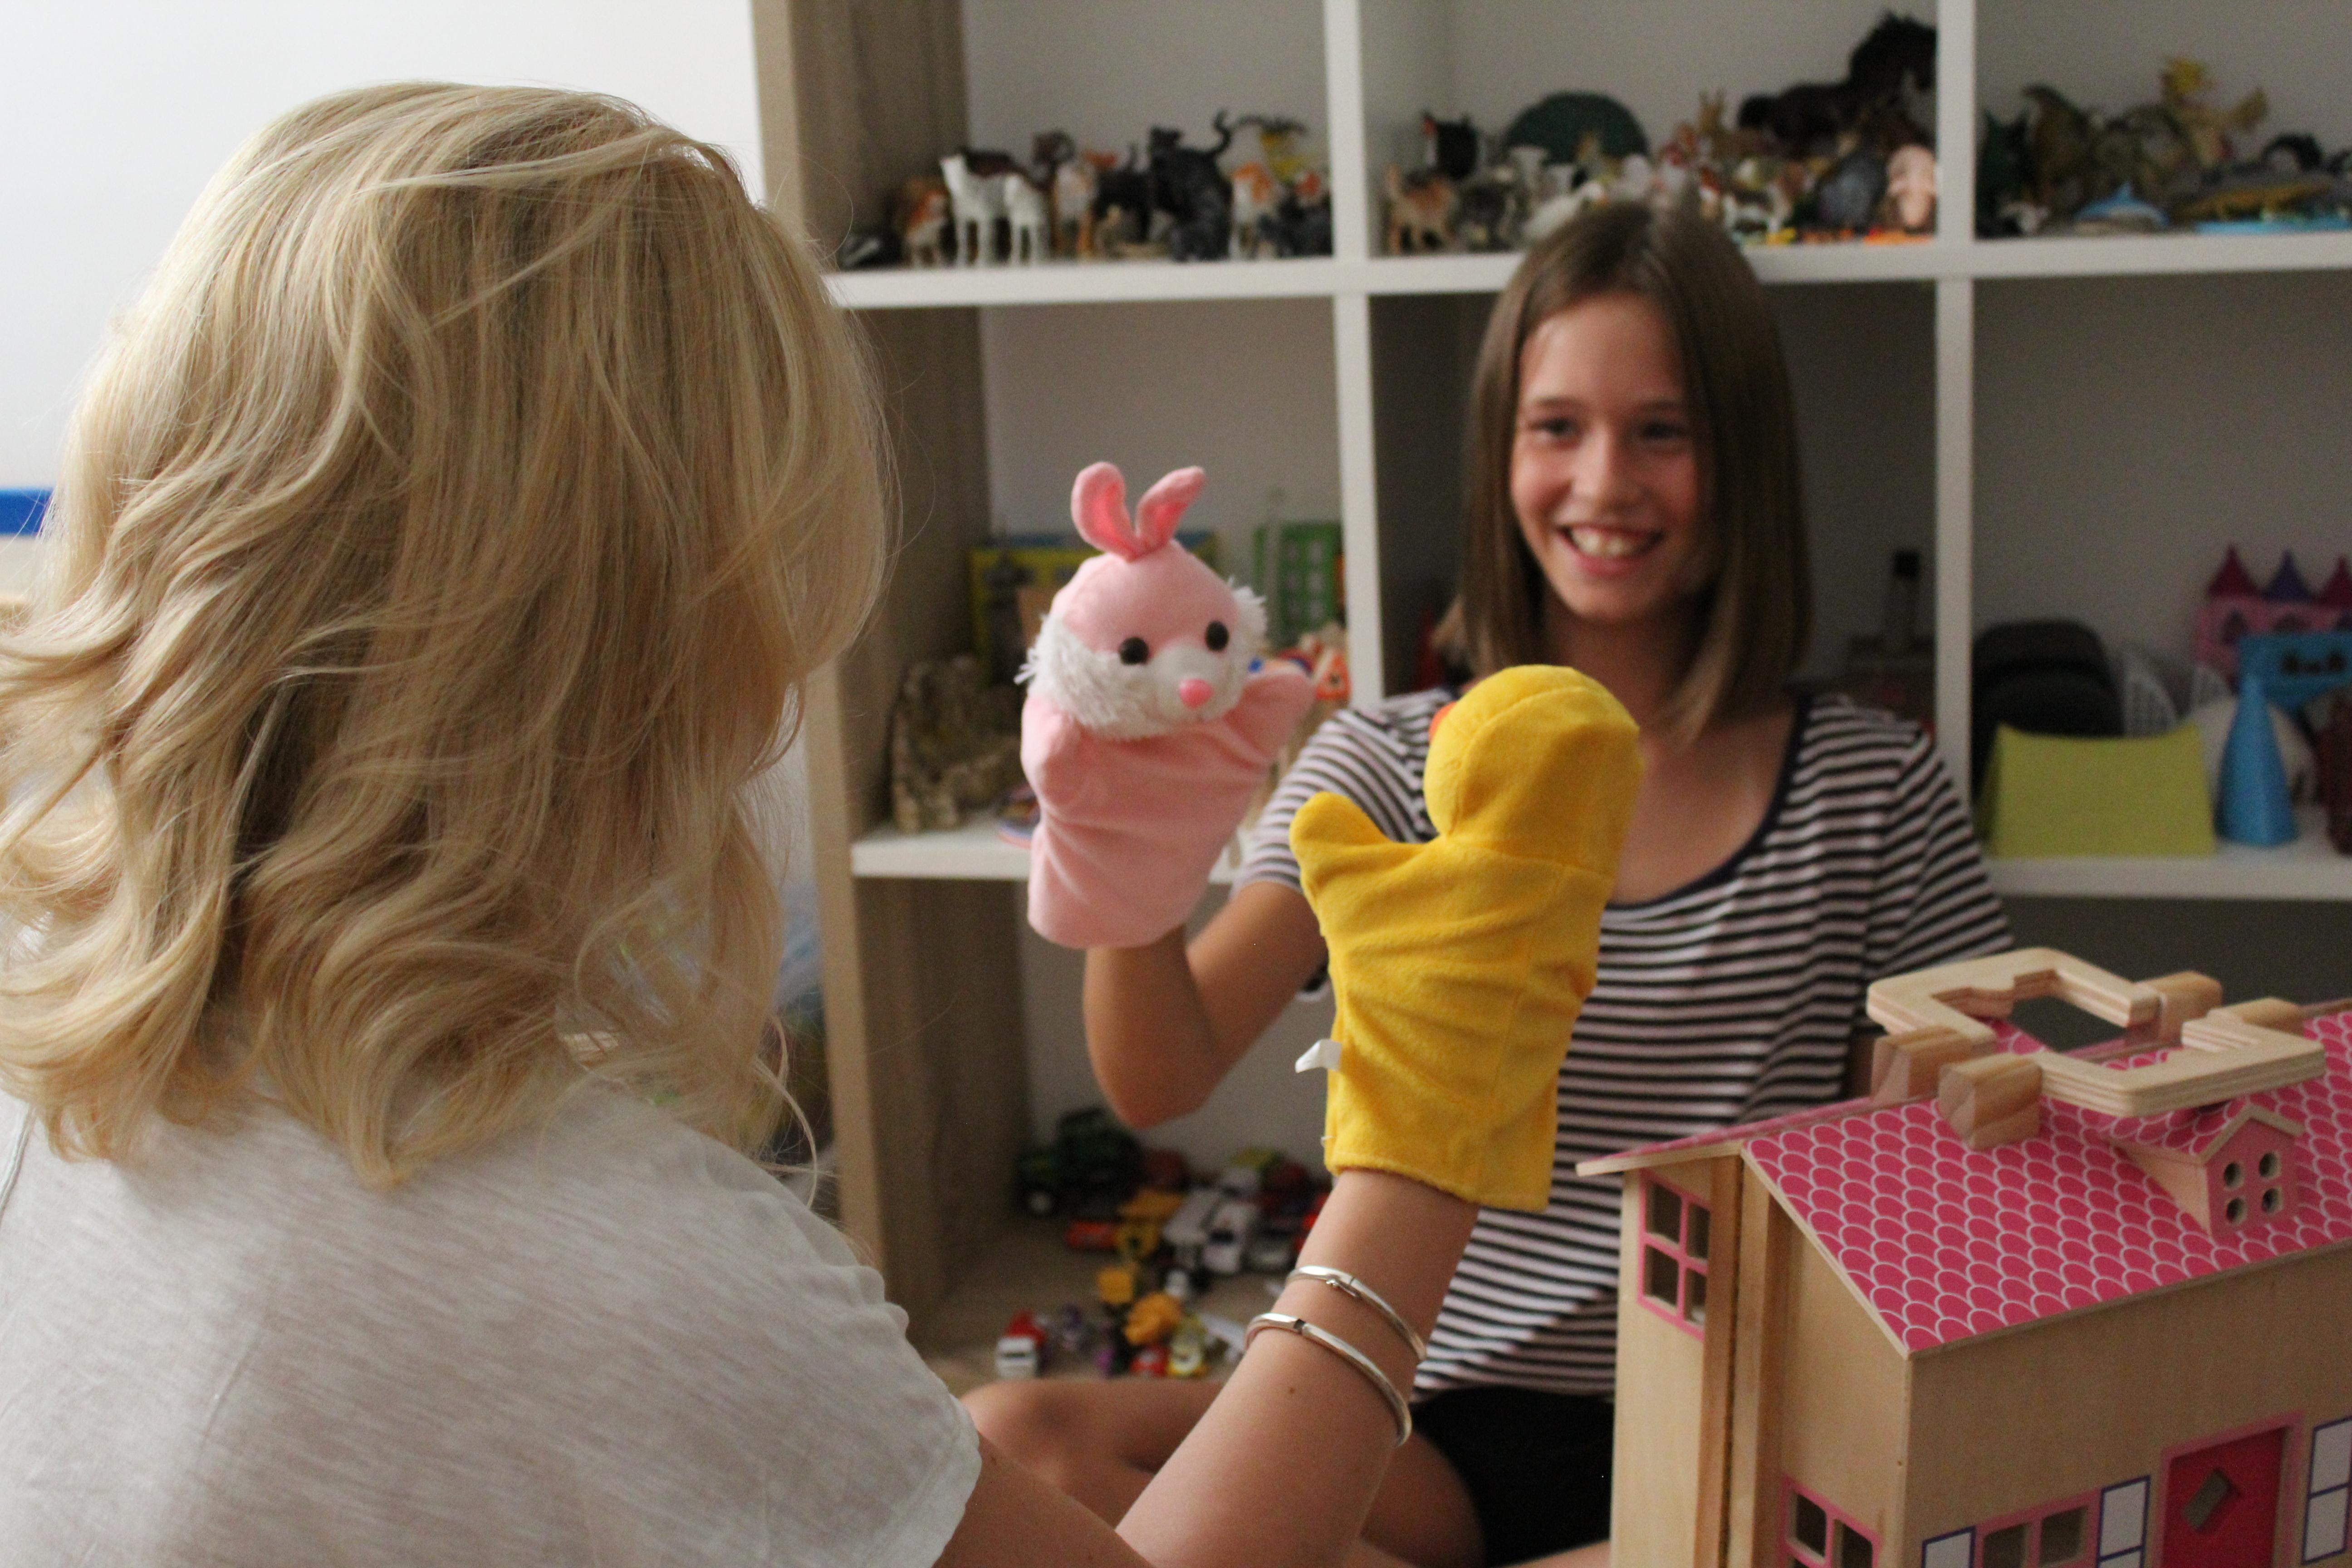 maja psihoterapeut sa decom